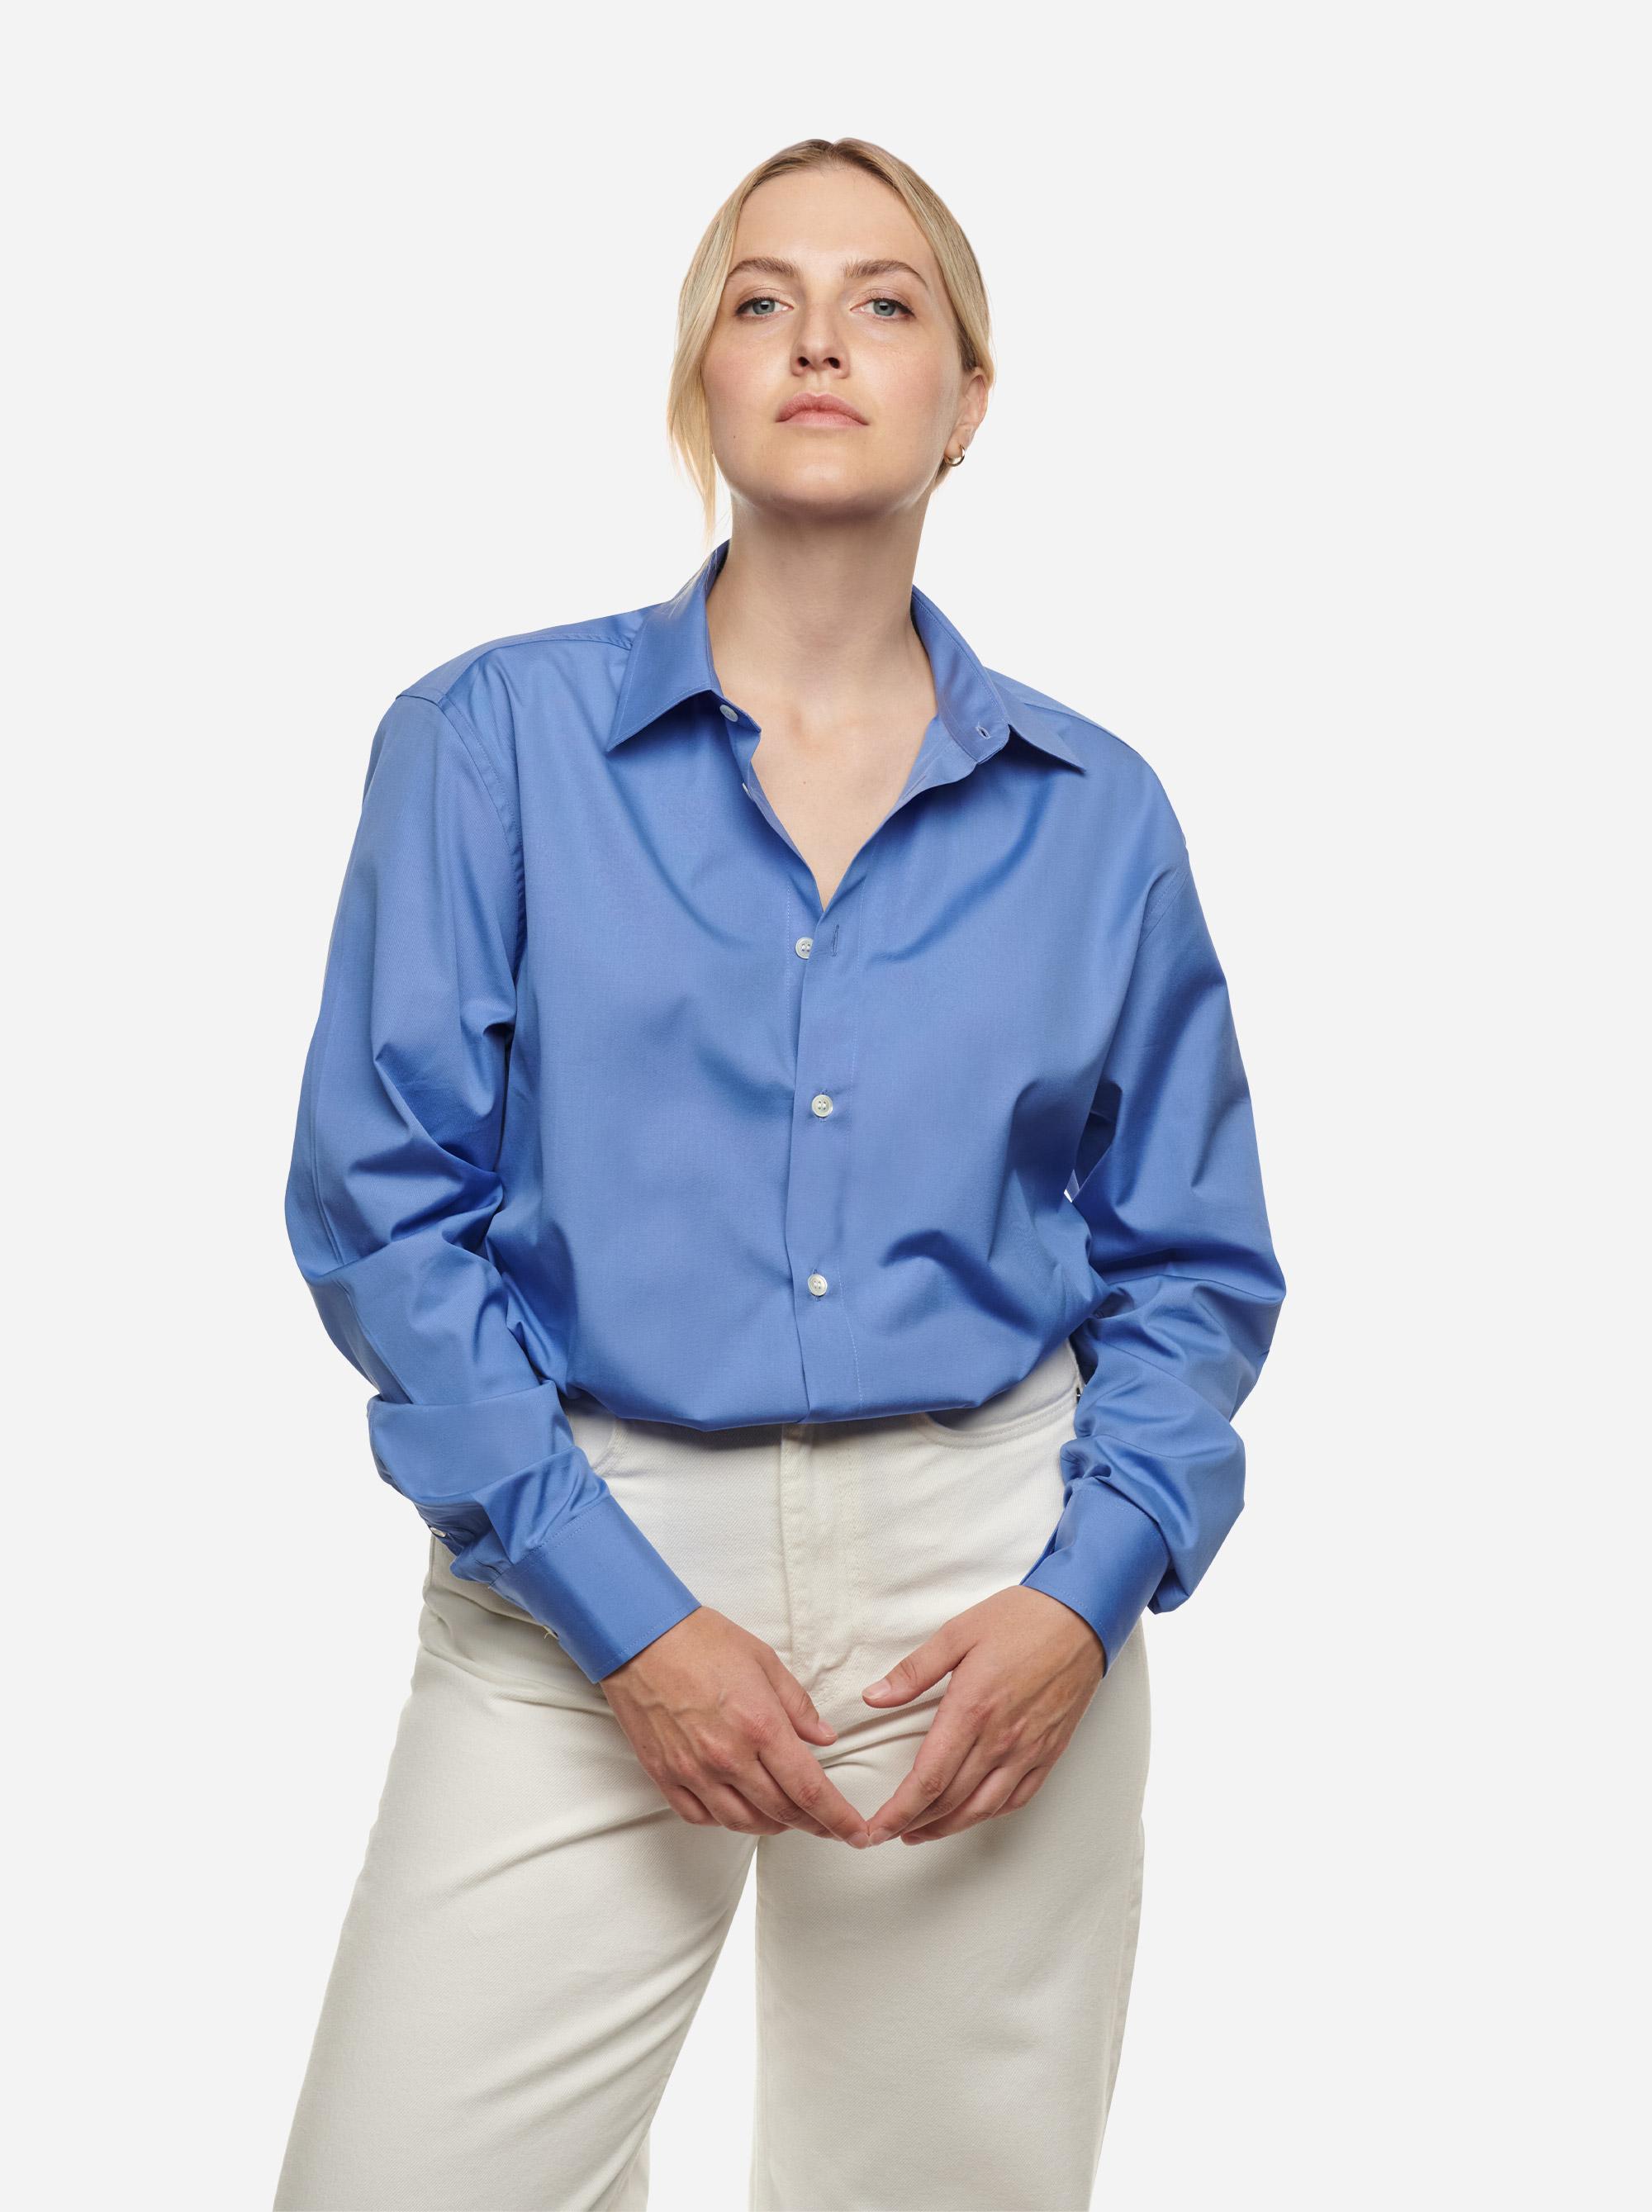 Teym-Shirt-Blue-women-mens-1